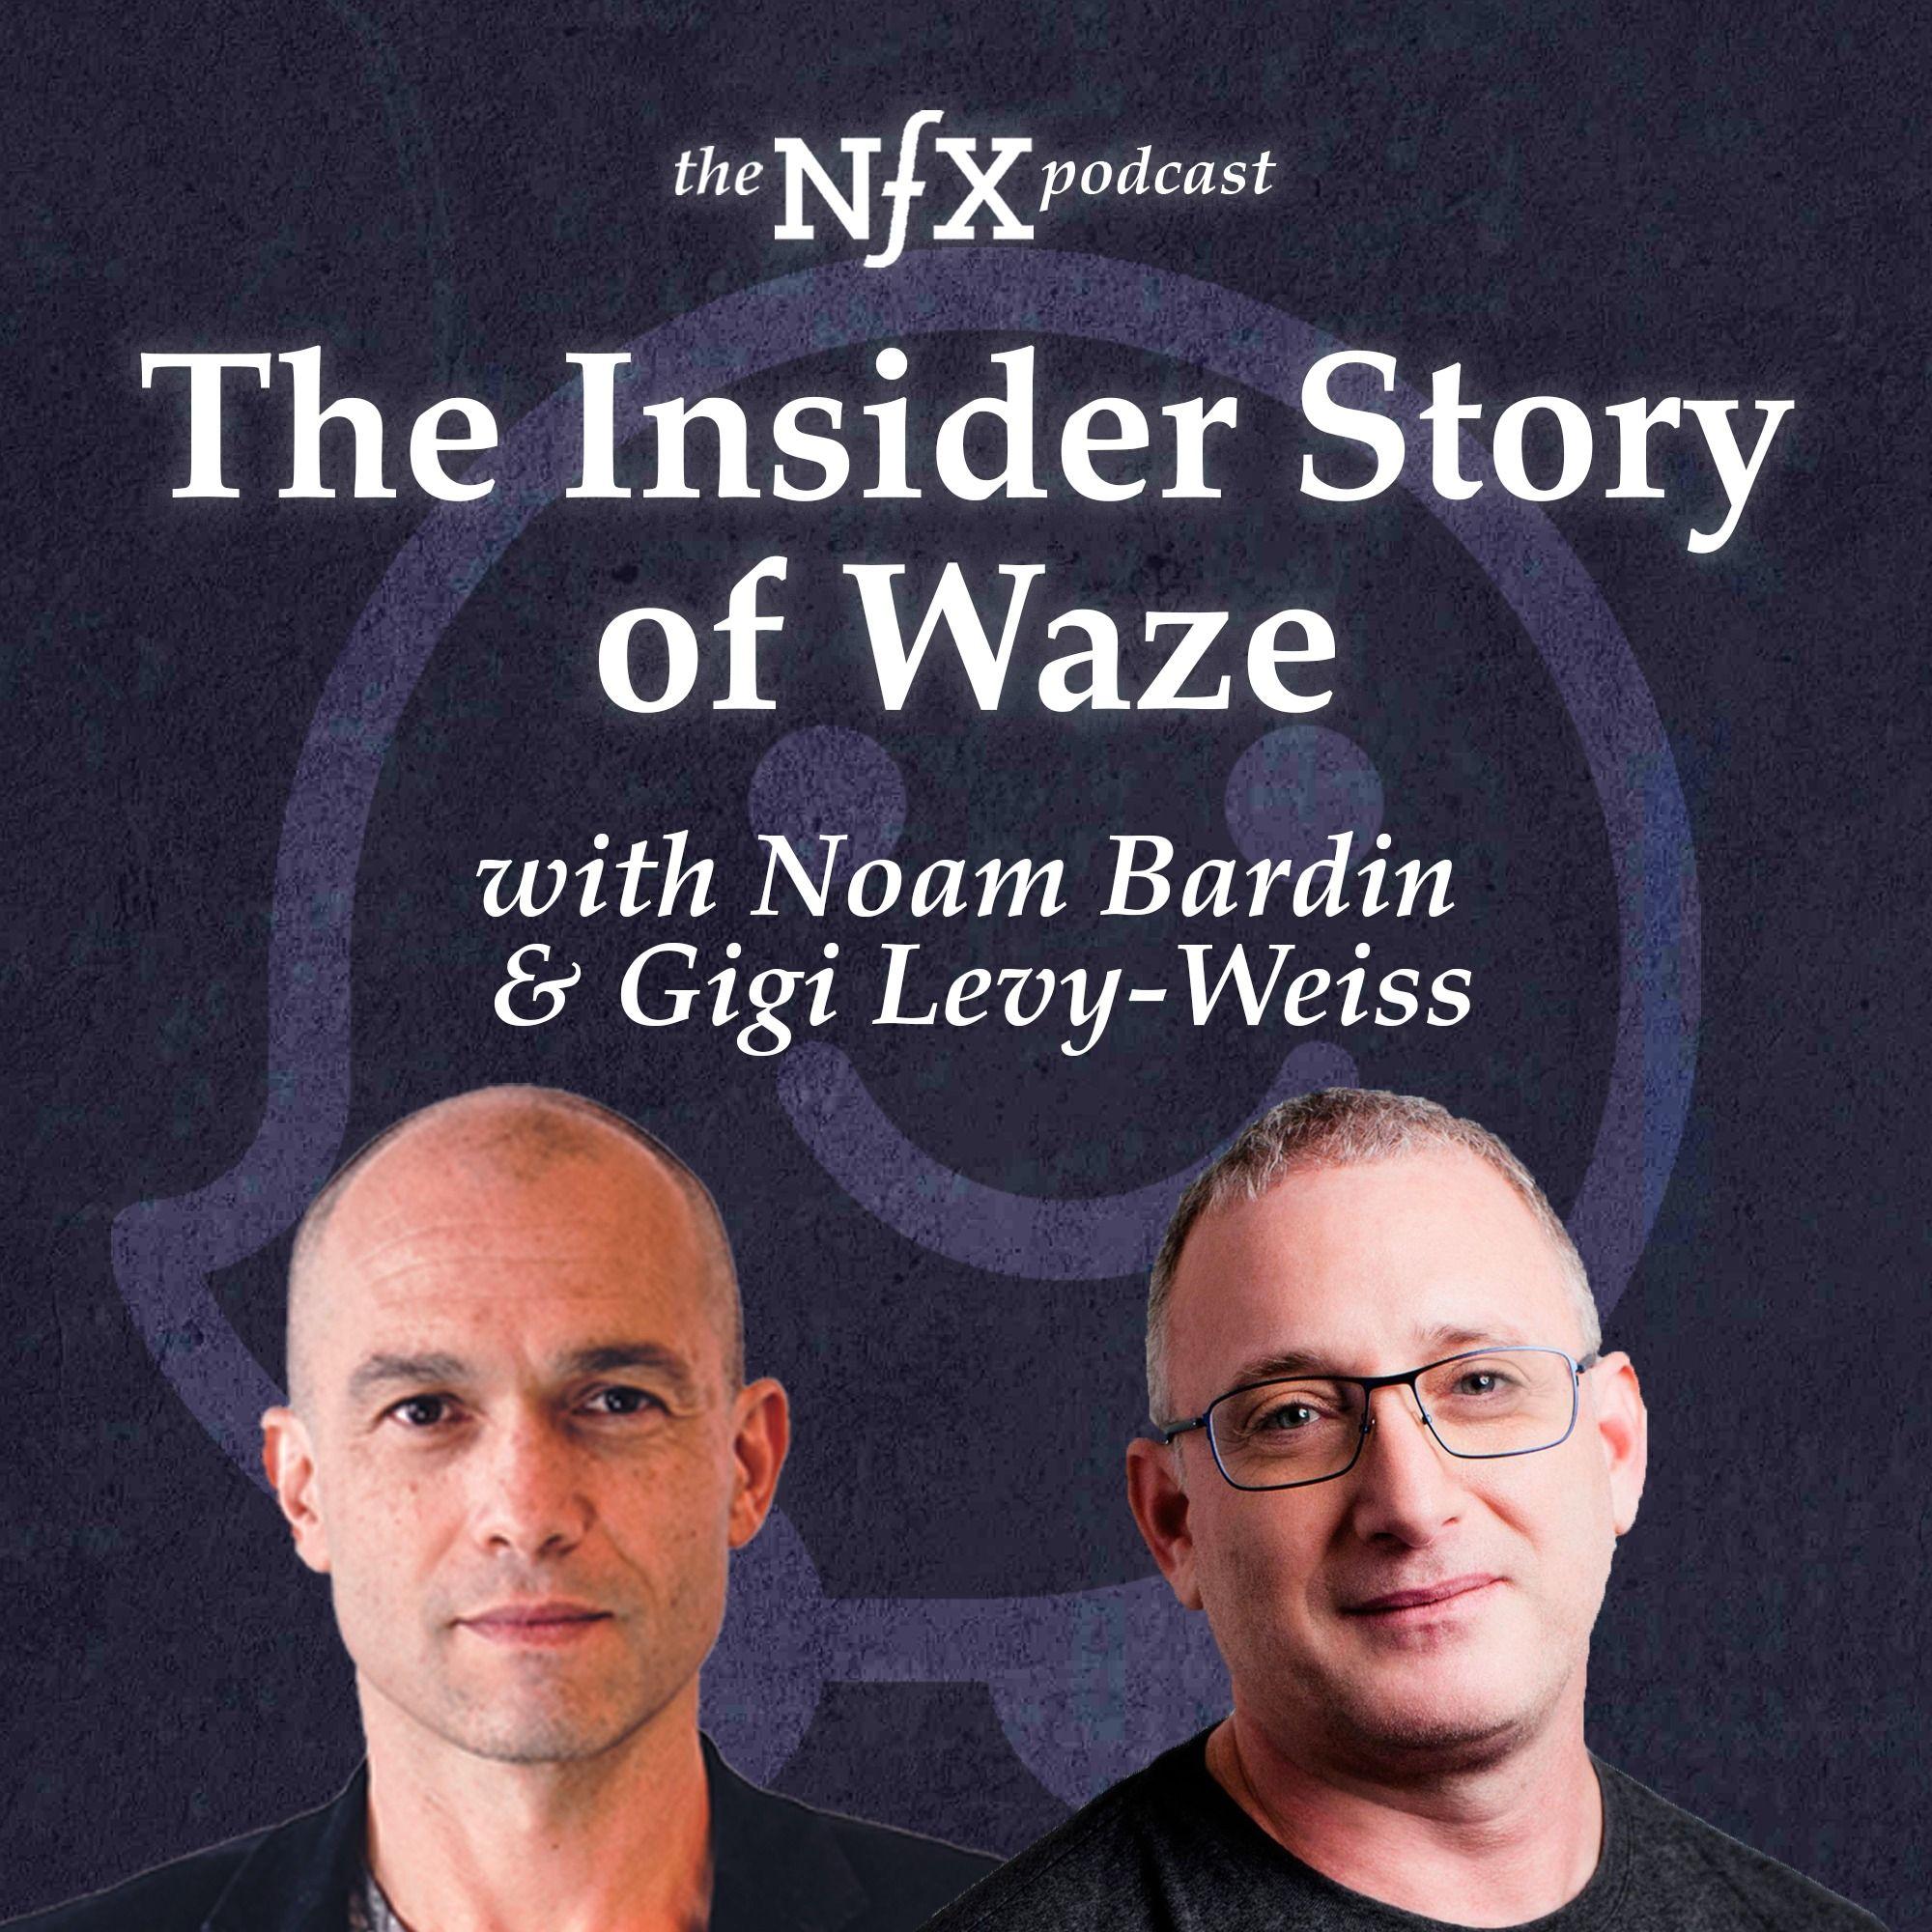 The Insider Story of Waze with Noam Bardin